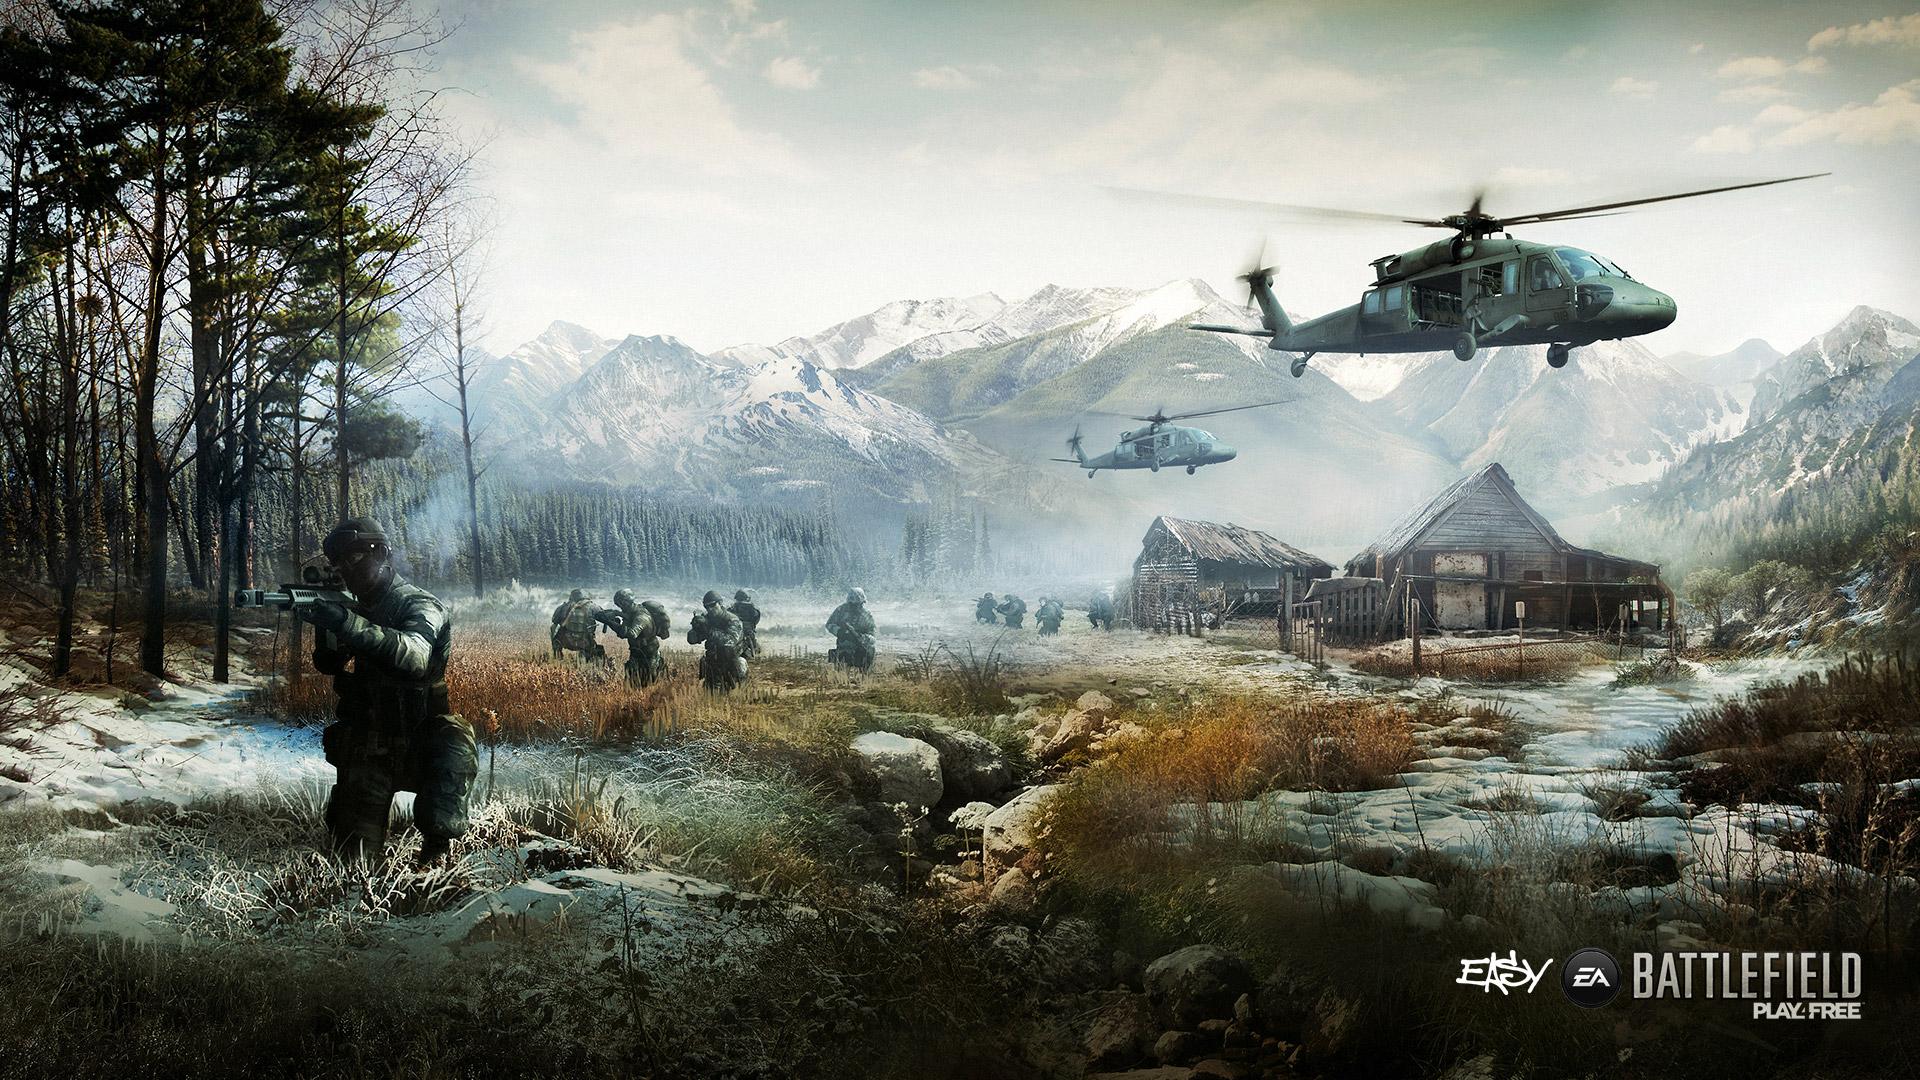 45 Battlefield 4 Animated Wallpapers On Wallpapersafari